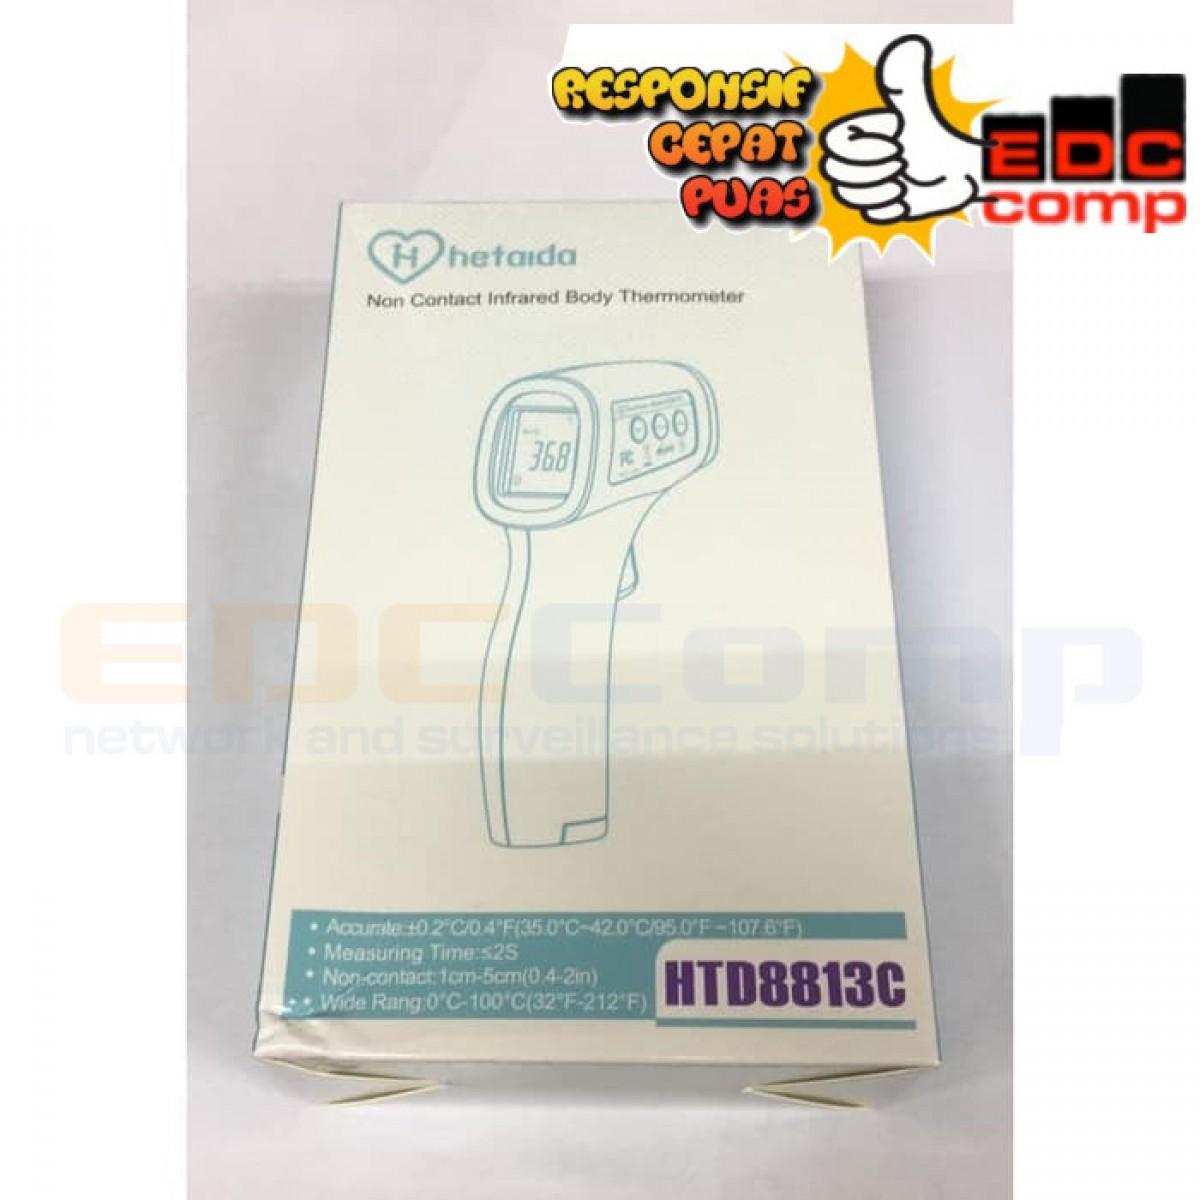 Termometer Infrared Body Hetaida HTD8813C - EdcComp